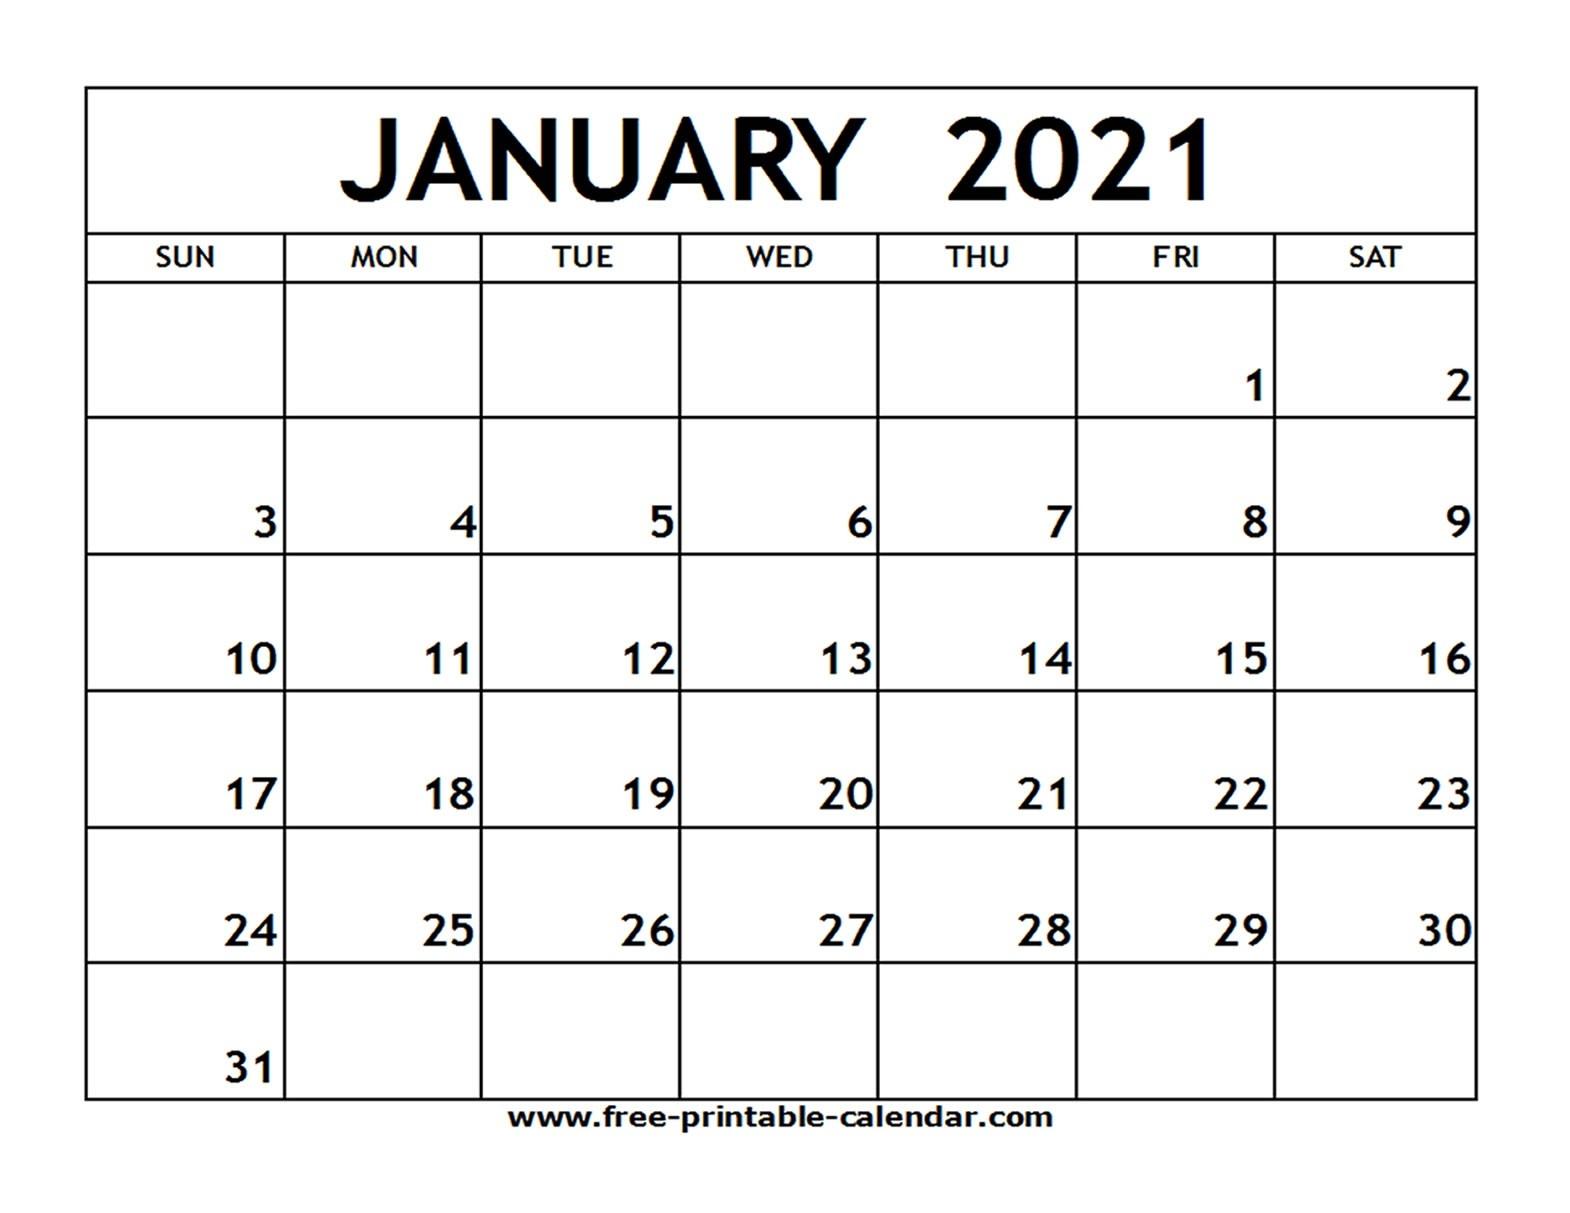 January 2021 Printable Calendar - Free-Printable-Calendar-Fill In Blank Calendar 2021